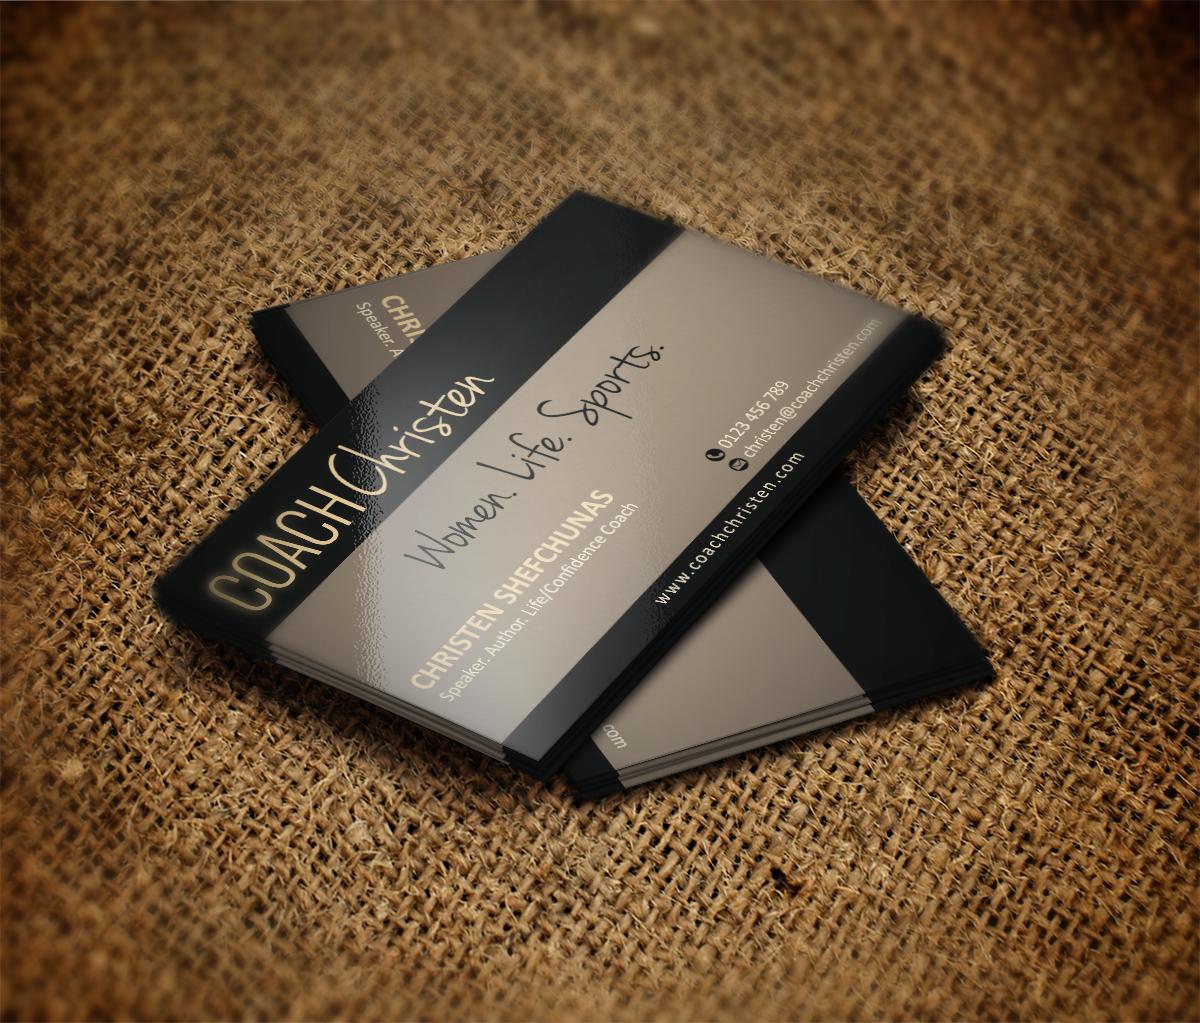 Business Card Design for Christen Shefchunas by MT | Design #3356250